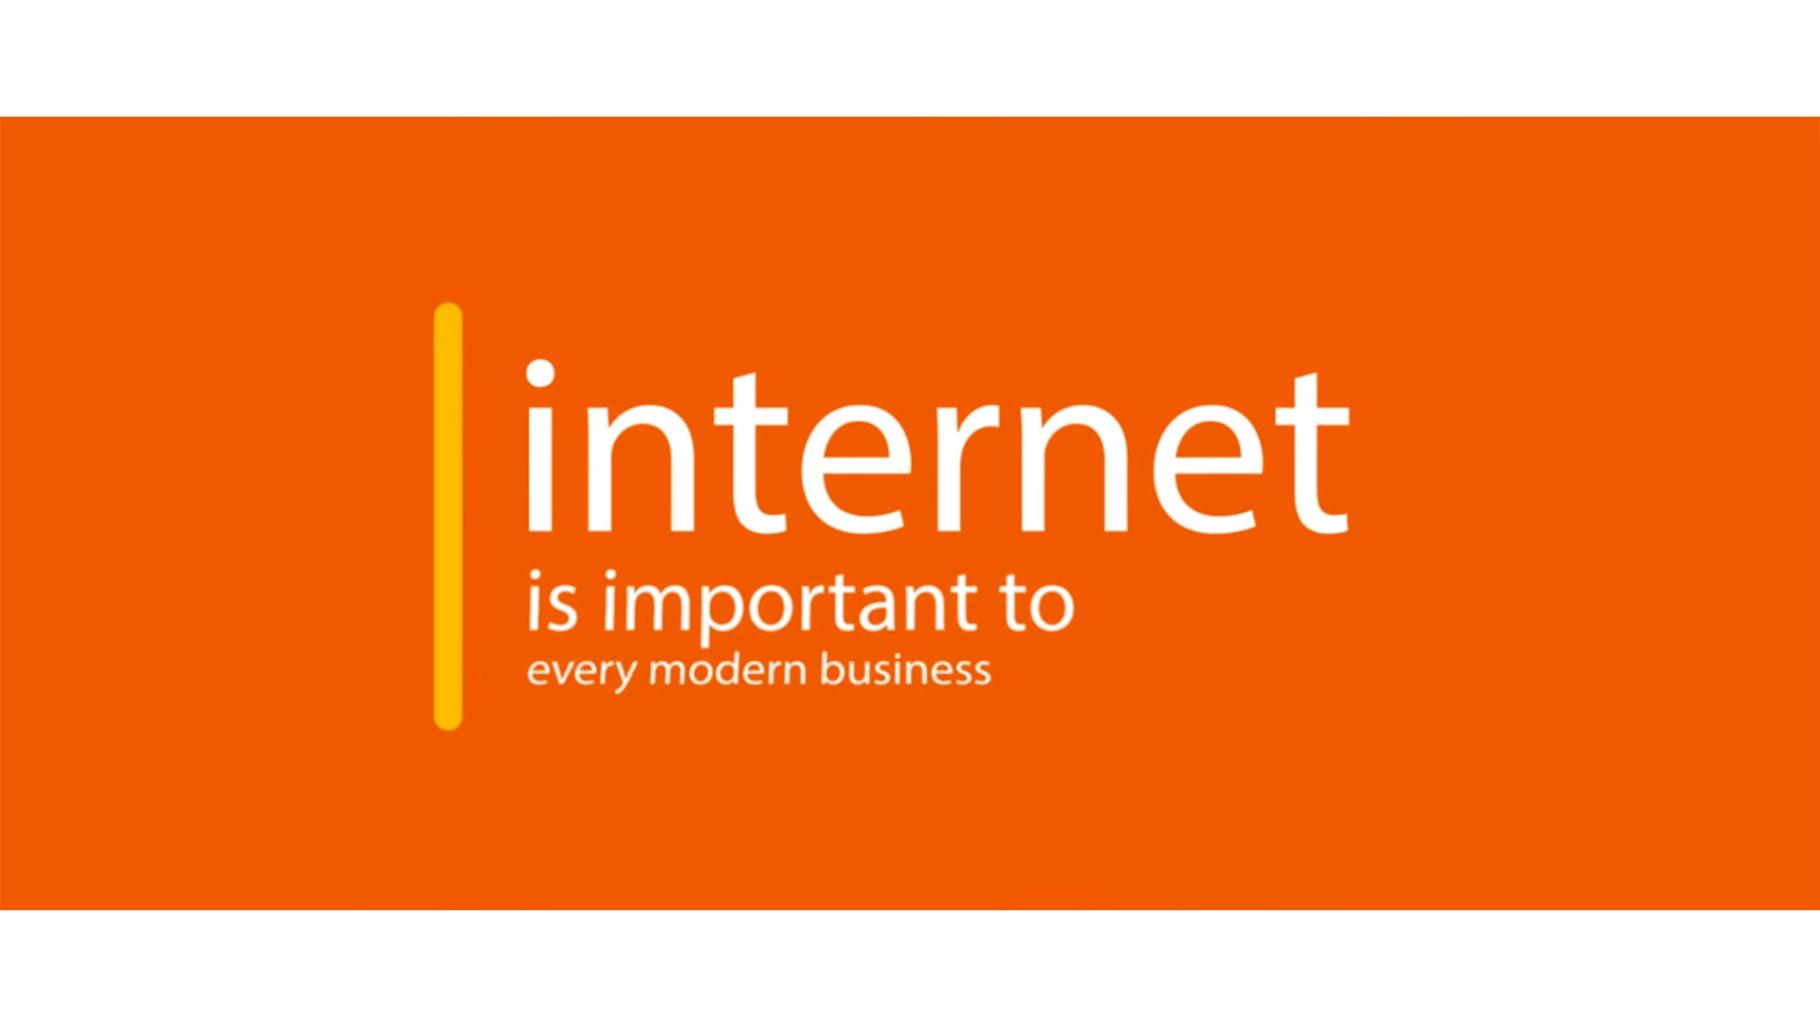 Teledata business internet tv ad 2015